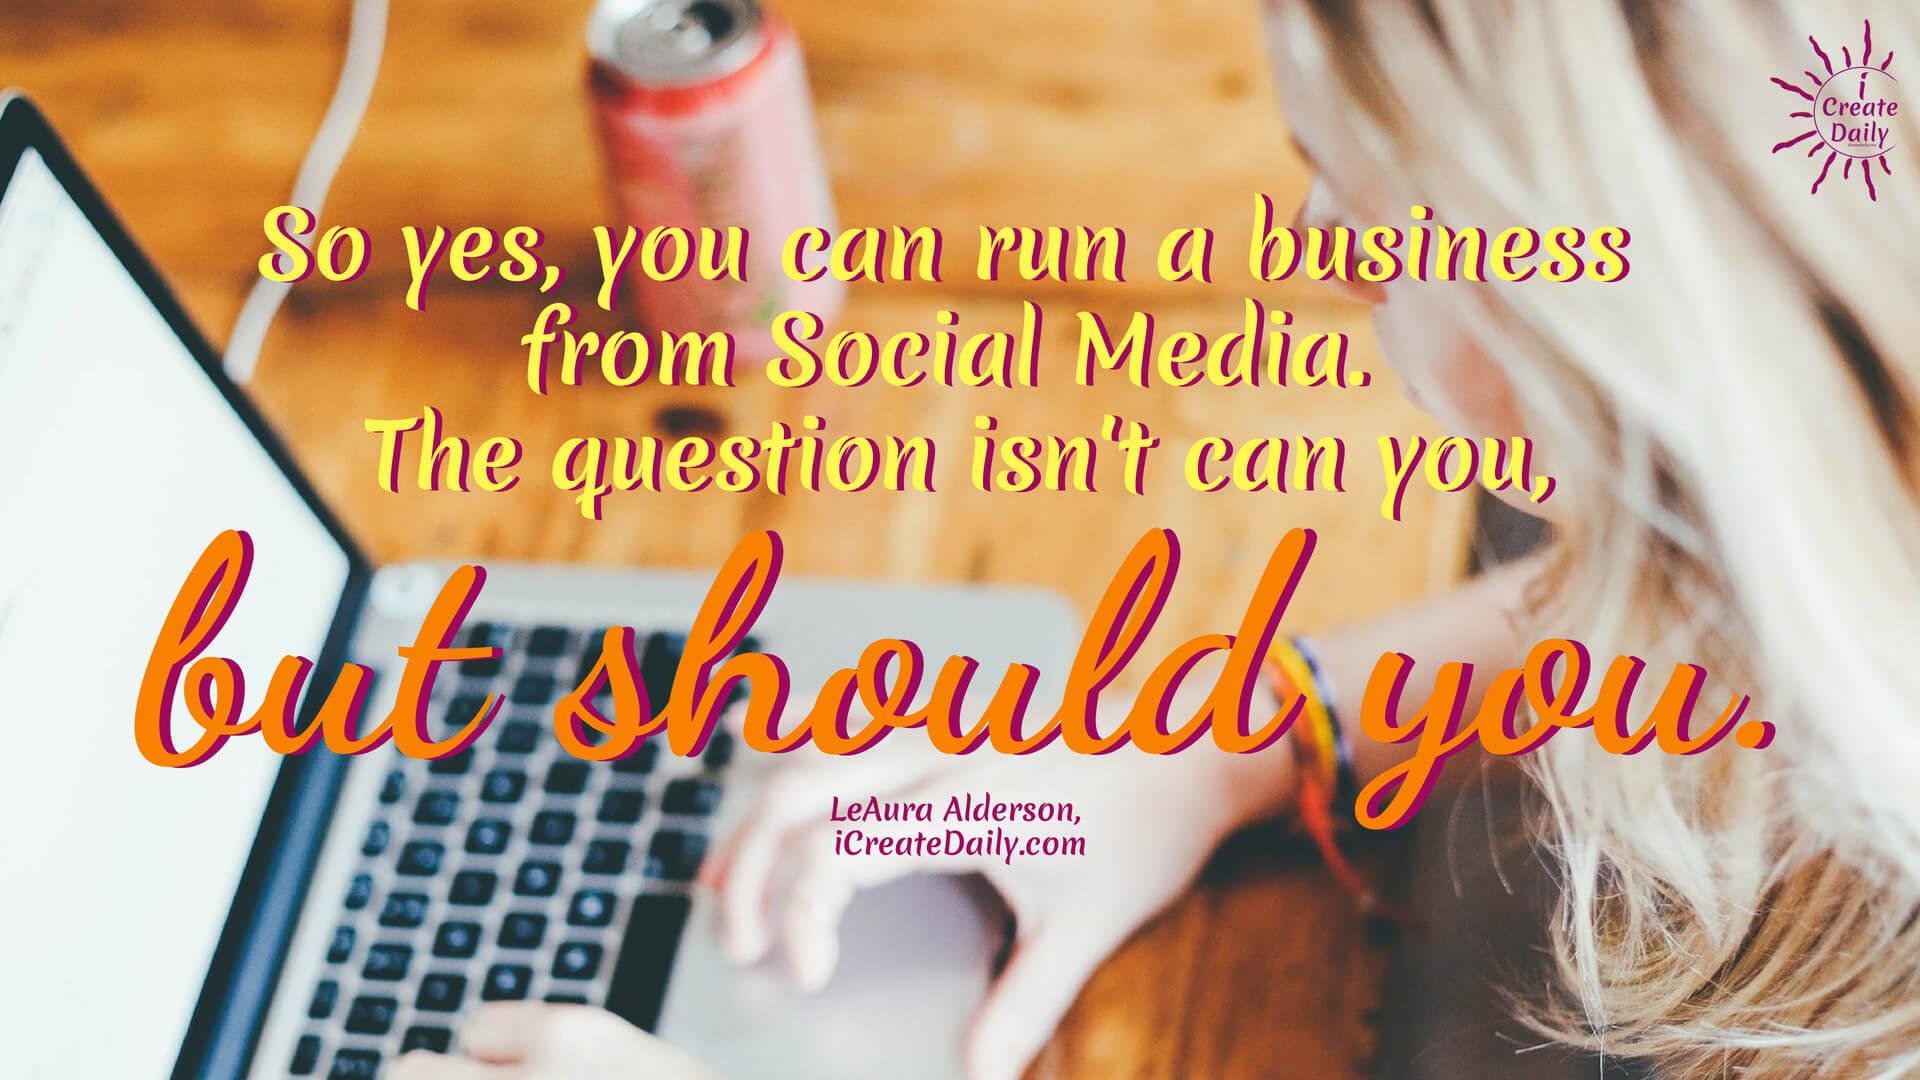 Run a Business From Social Media